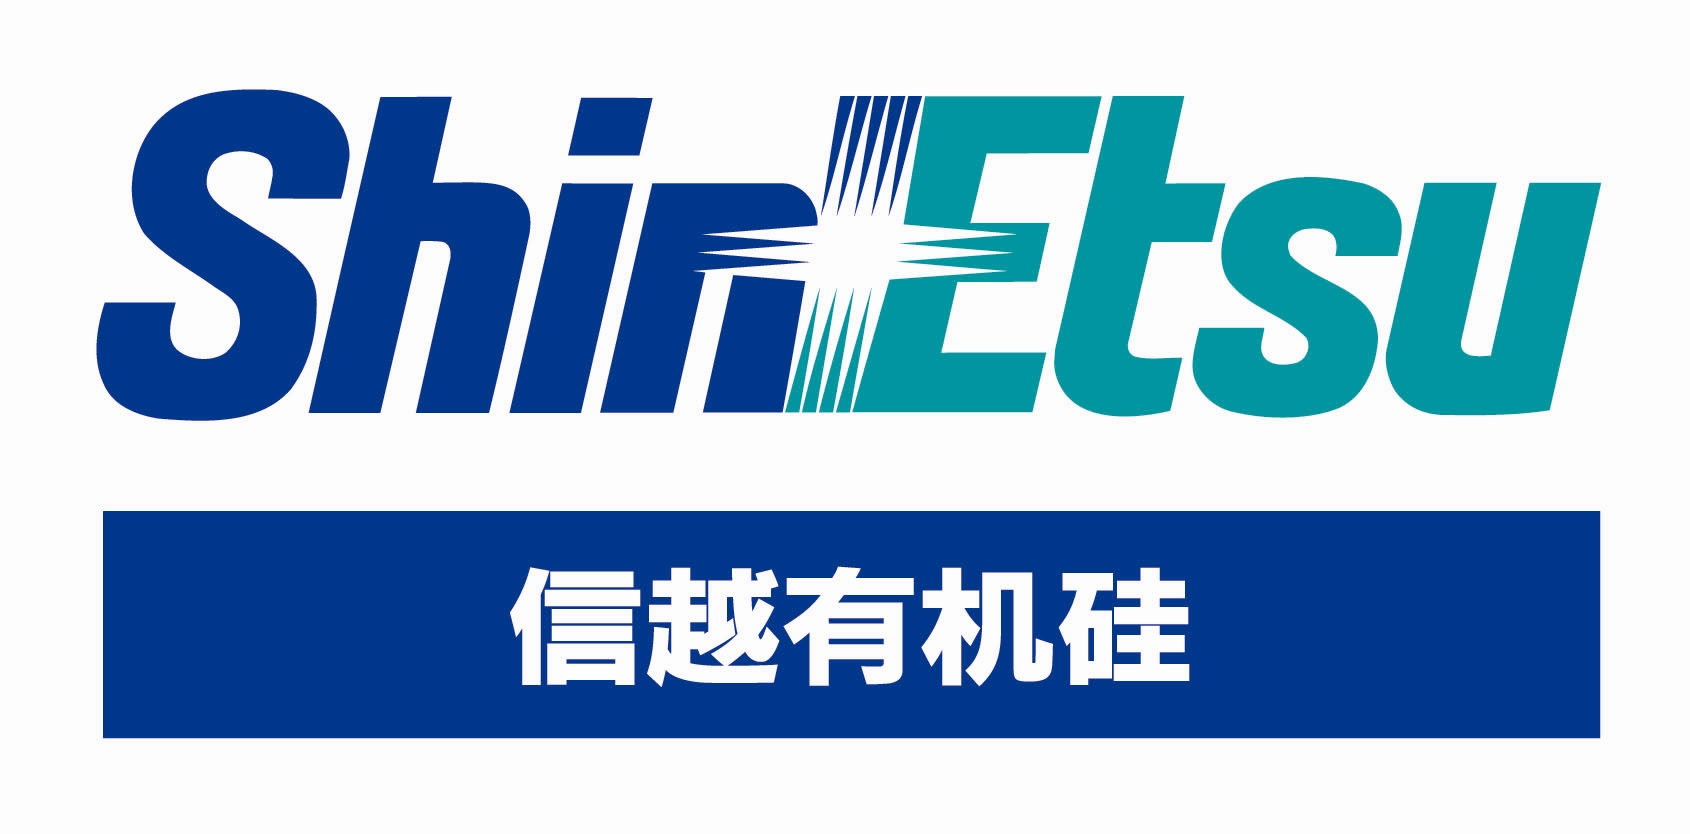 http://manual.pchi-china.com/highset/file/view/230113005956763649